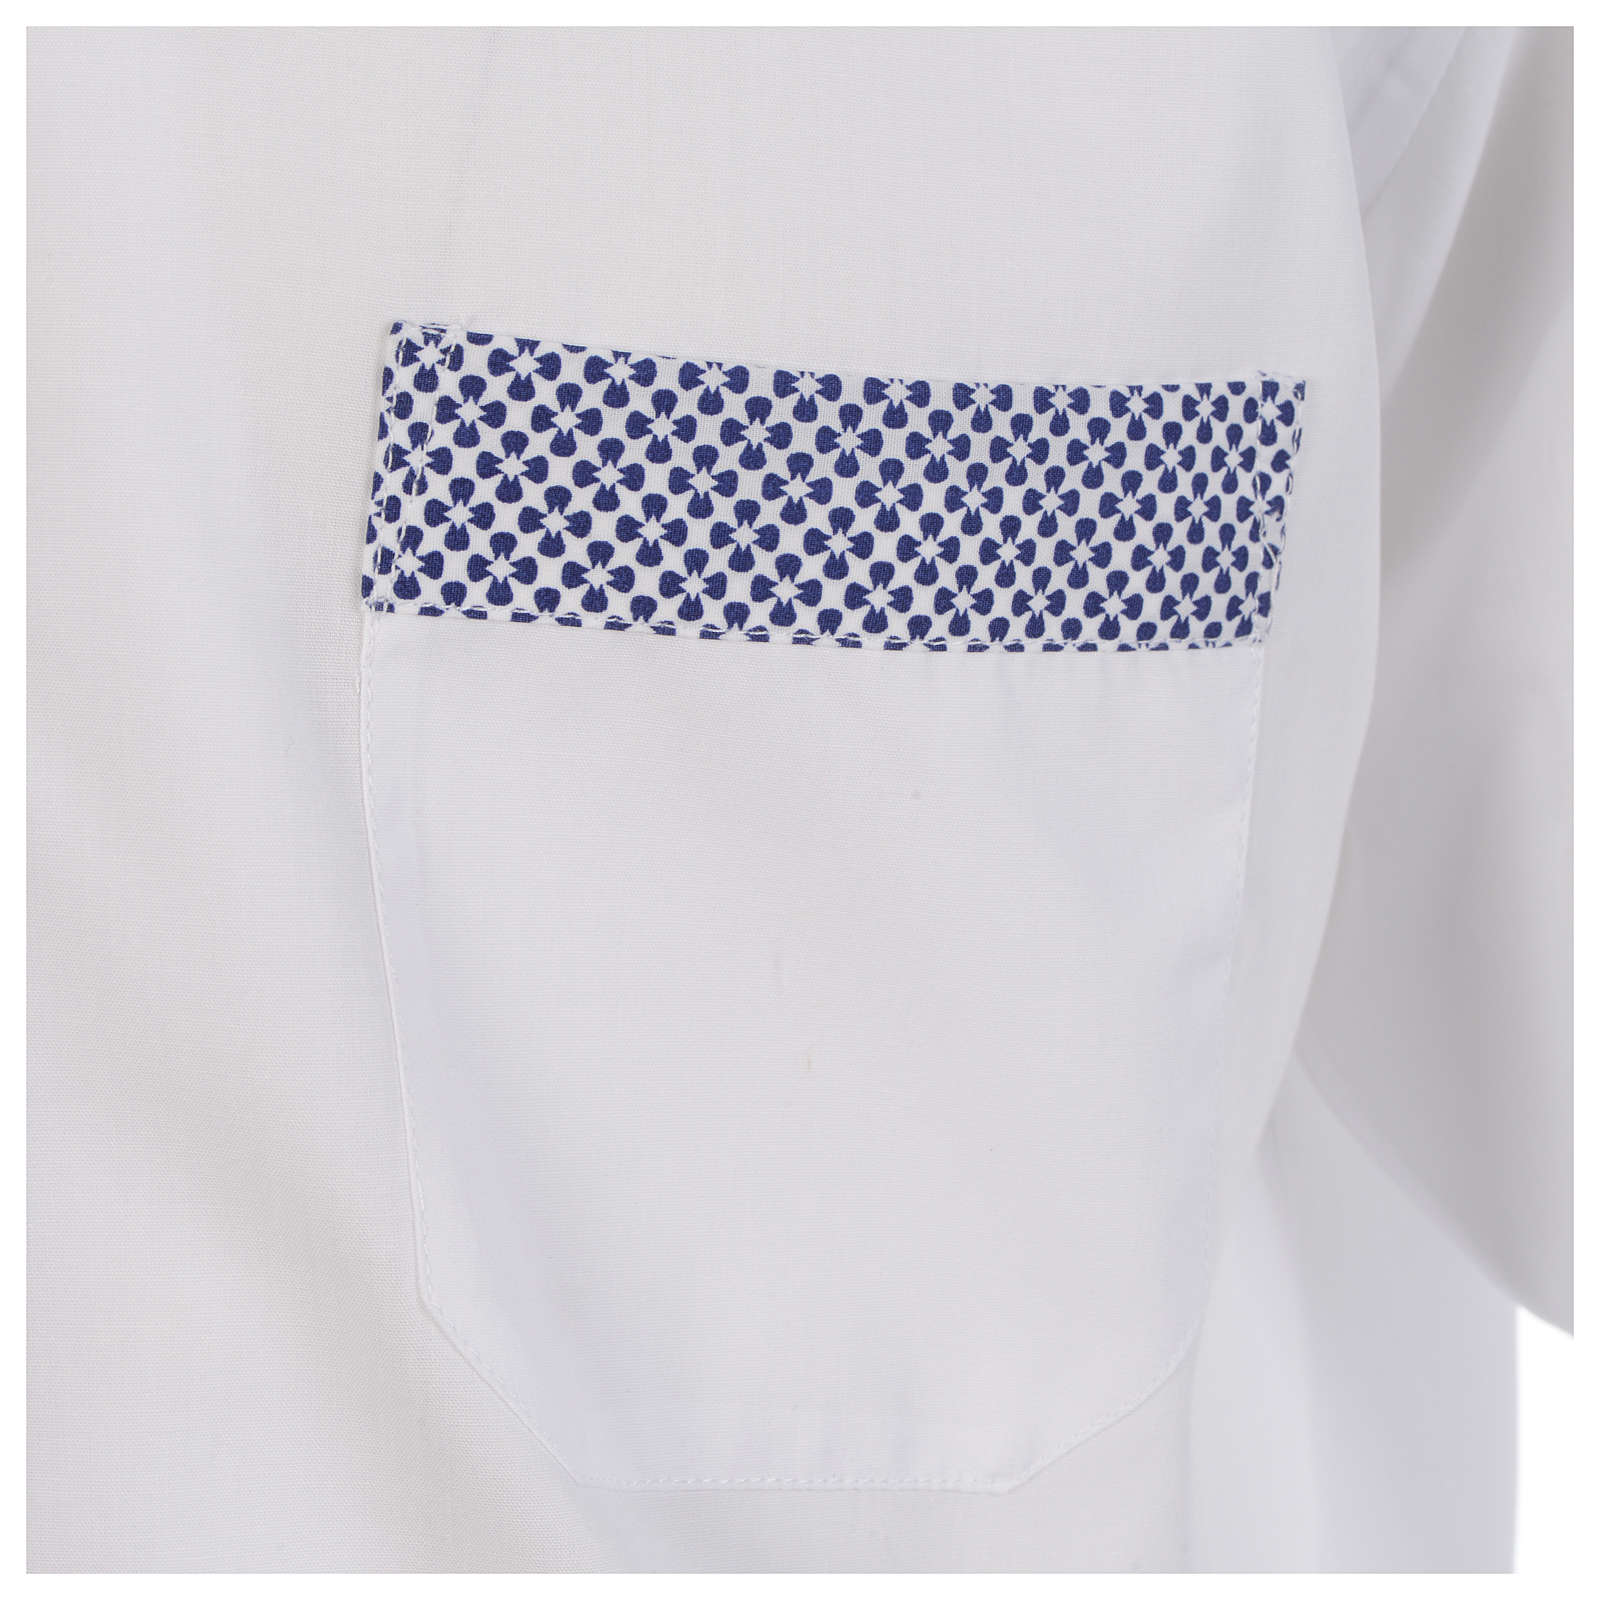 Camisa clergy sacerdote cruces blanco manga larga contraste 4